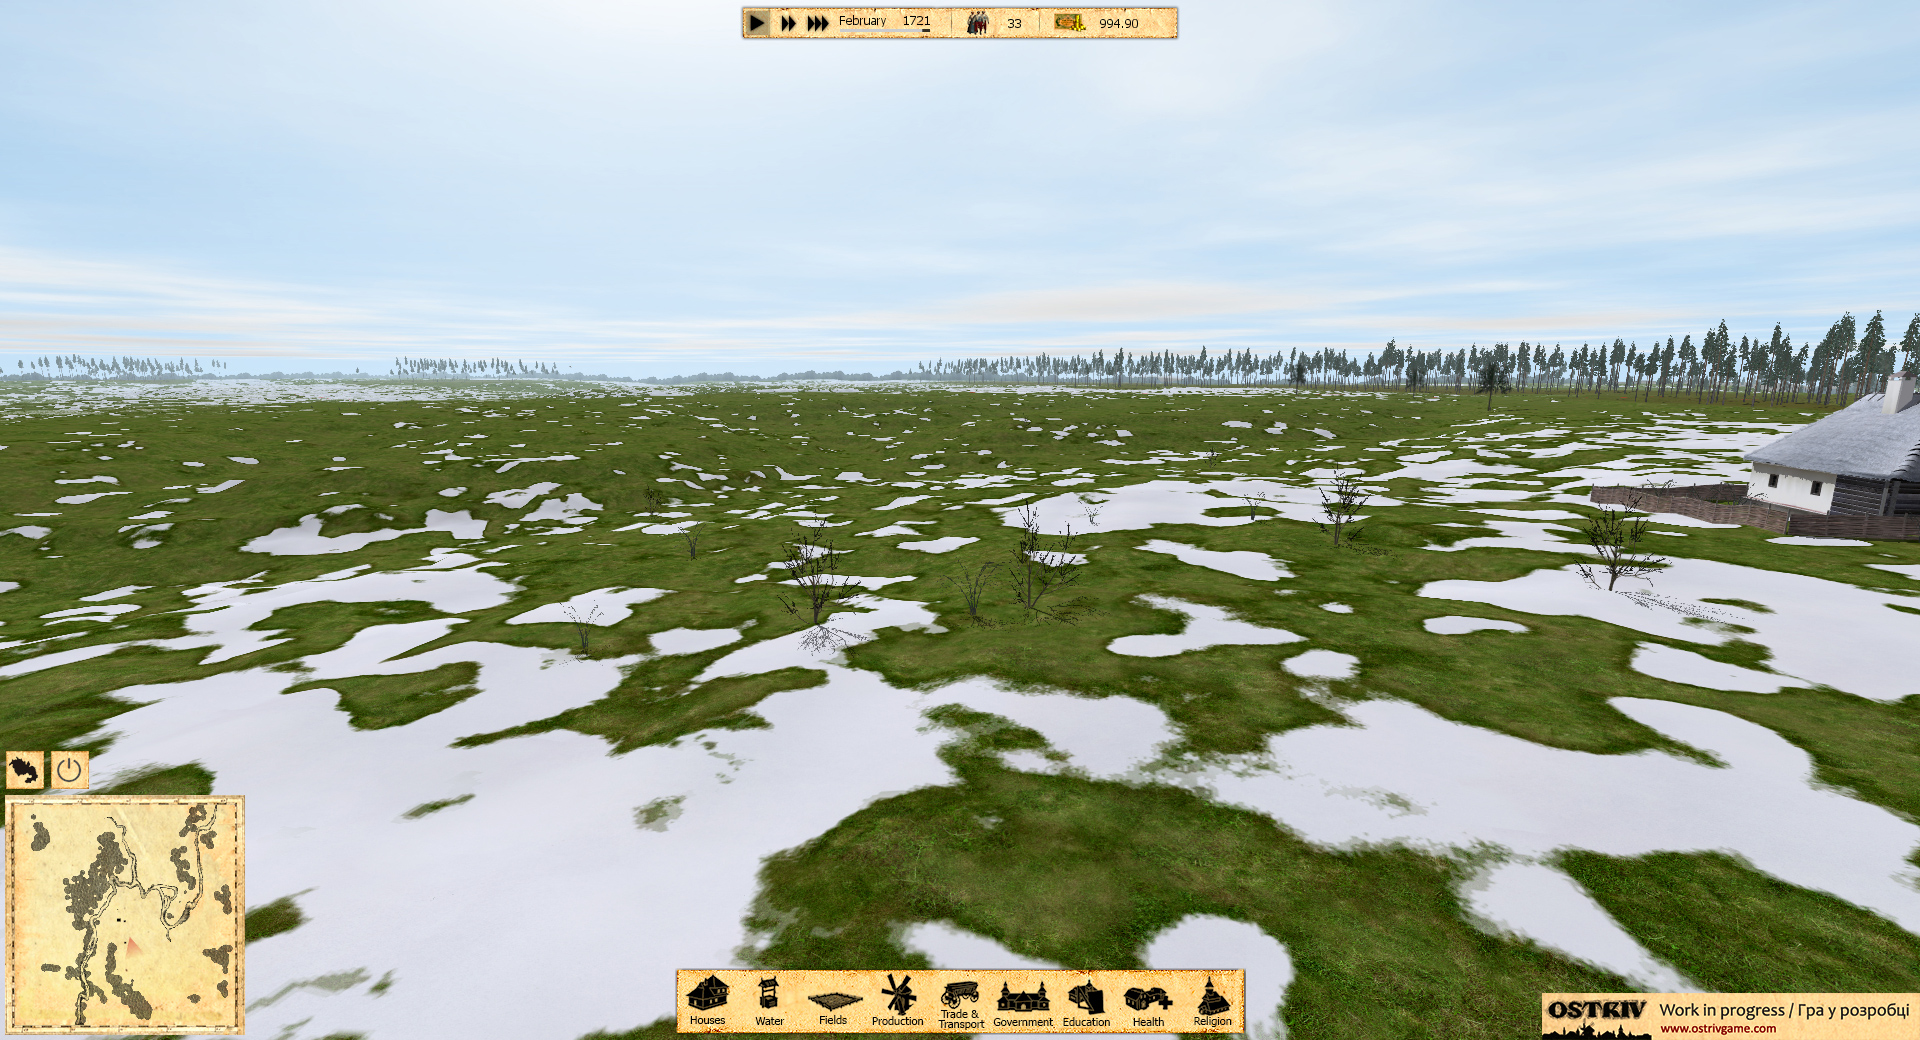 http://ostrivgame.com/wp-content/uploads/2016/12/spring.jpg